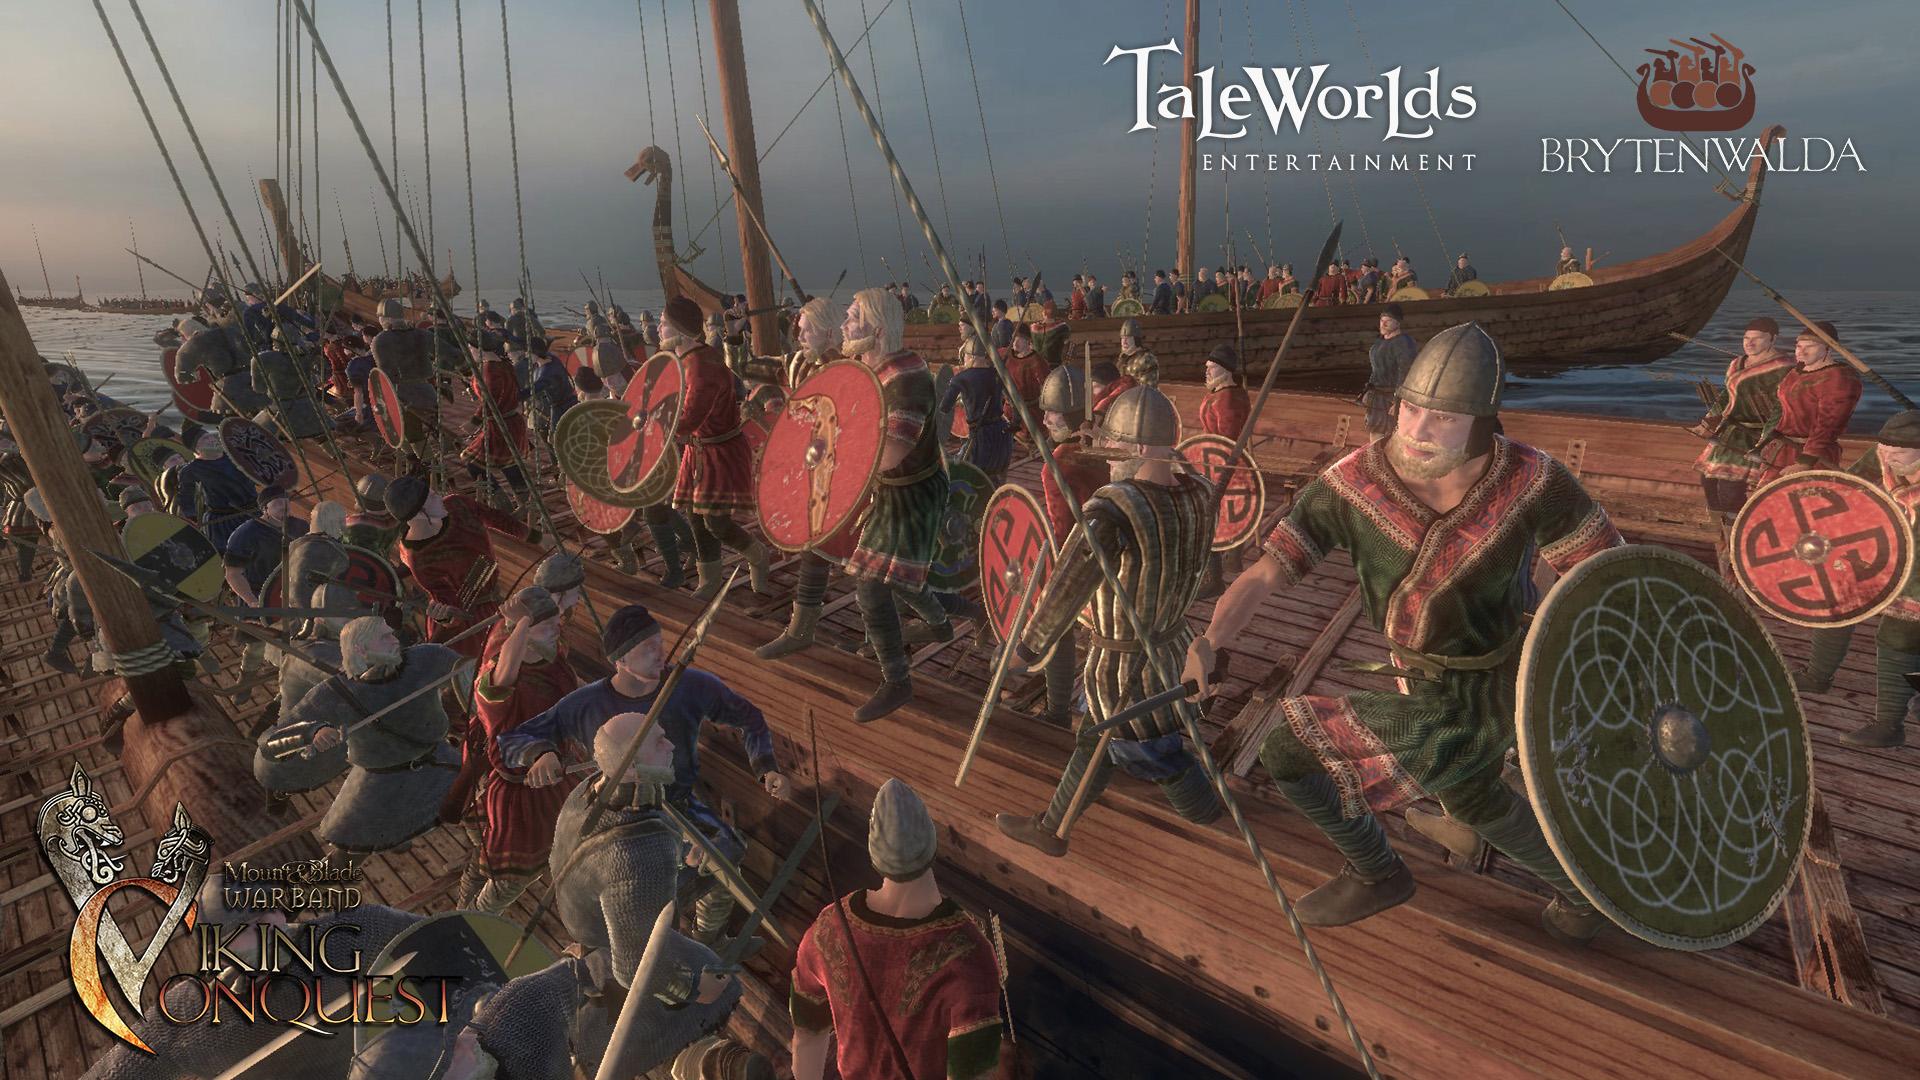 mount and blade warband viking conquest скачать торрент на русском 2015